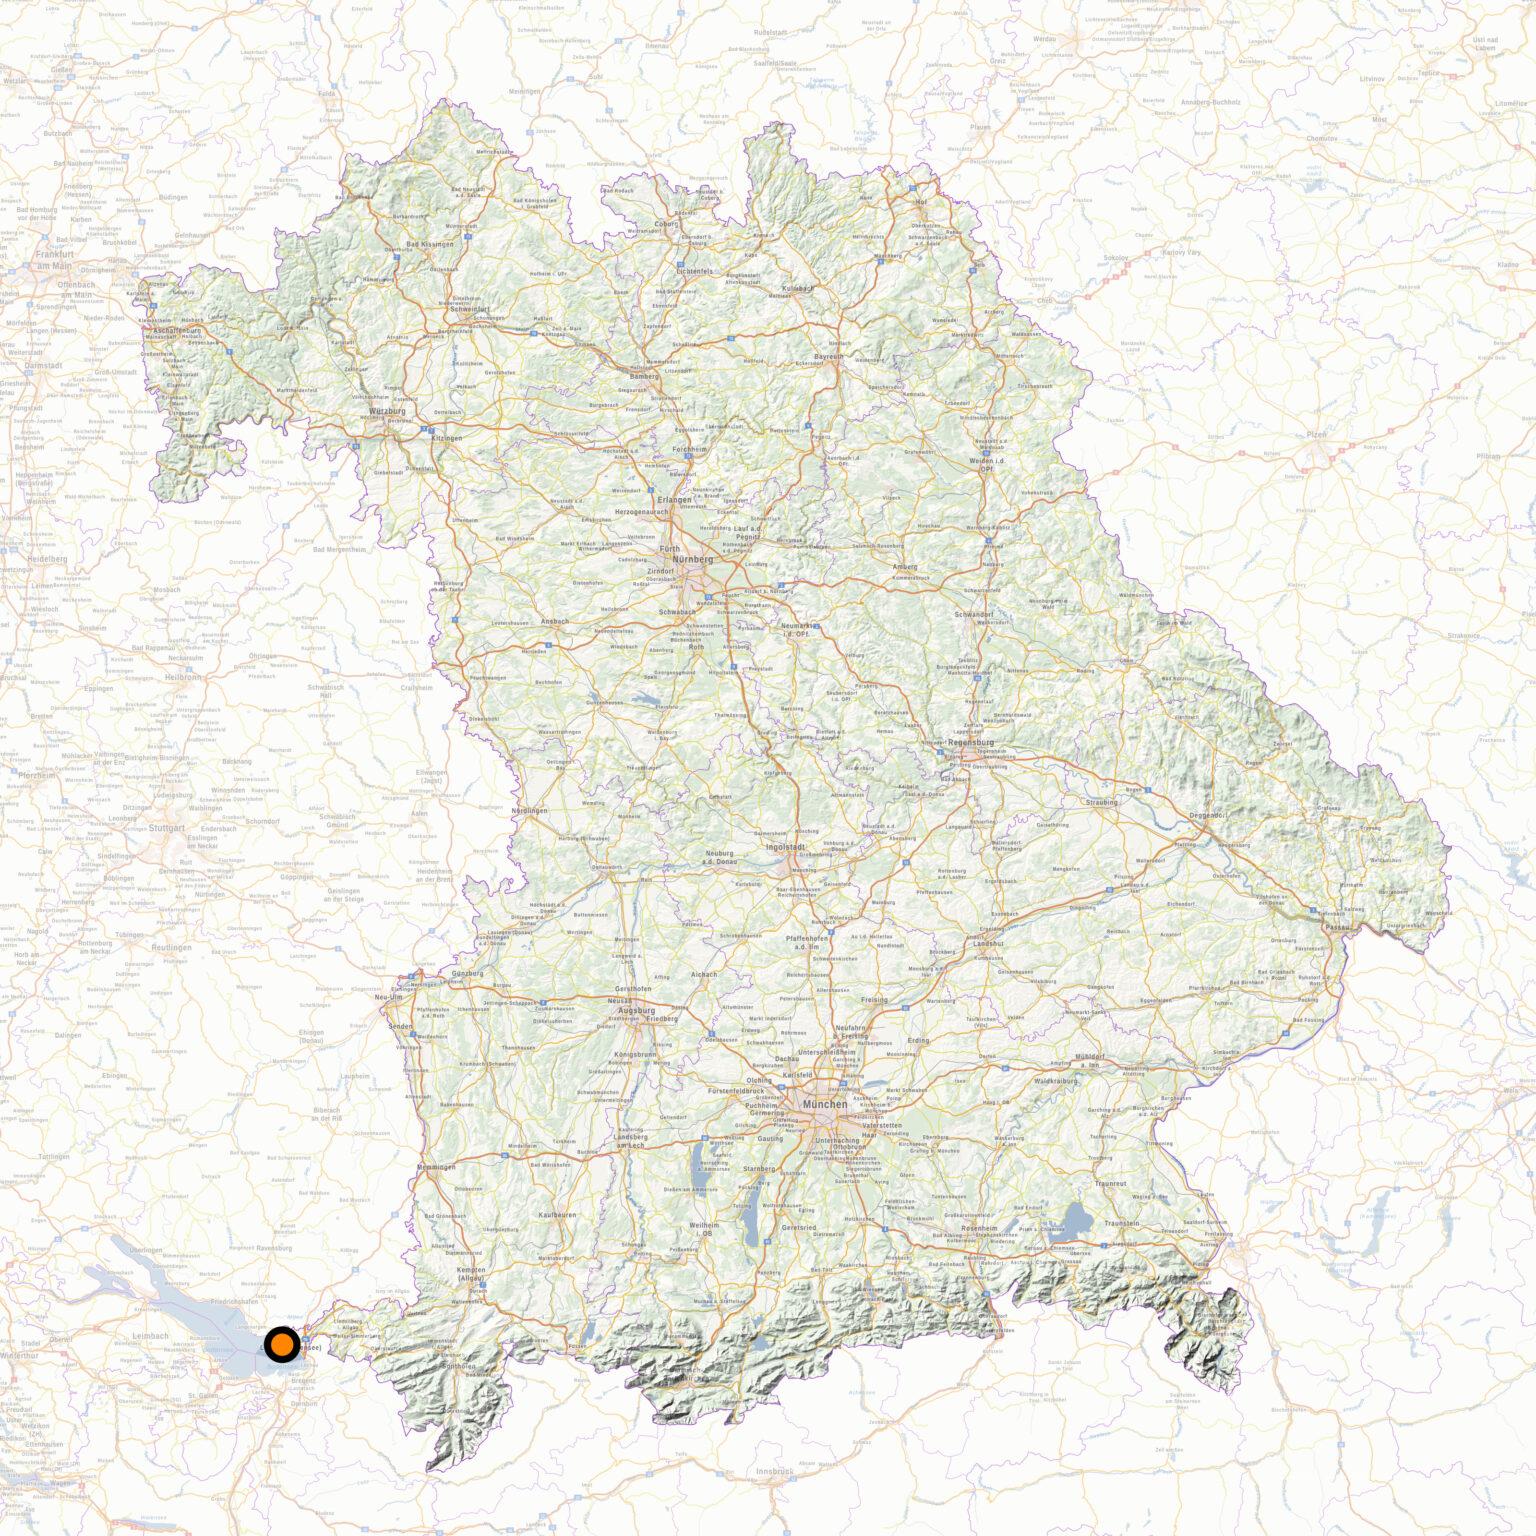 2020-07-25_Lindau_Start